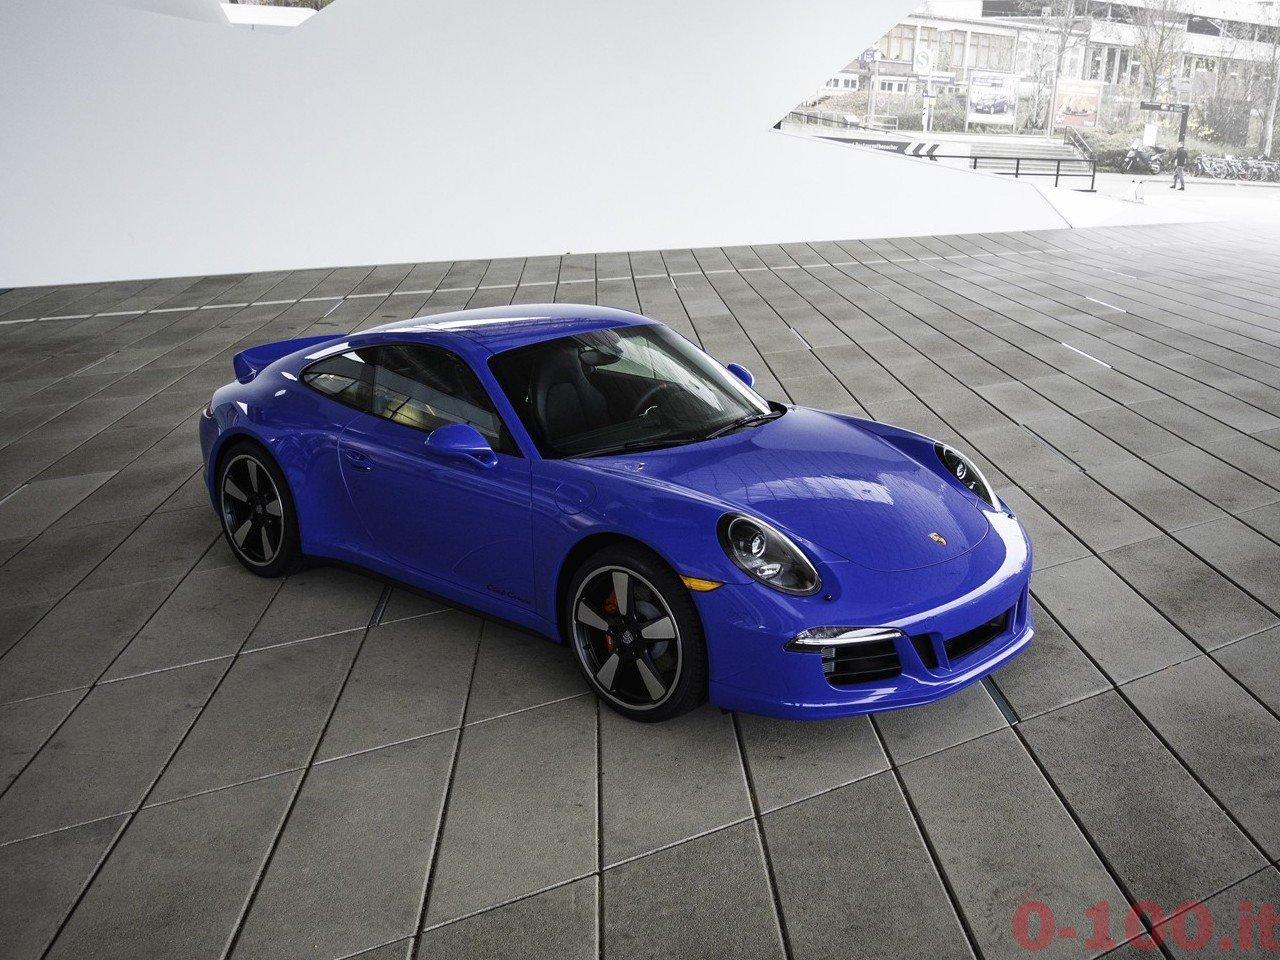 porsche-911-991-gts-club-coupe-60-esemplari-porsche-club-of-america-pca-0-100_1